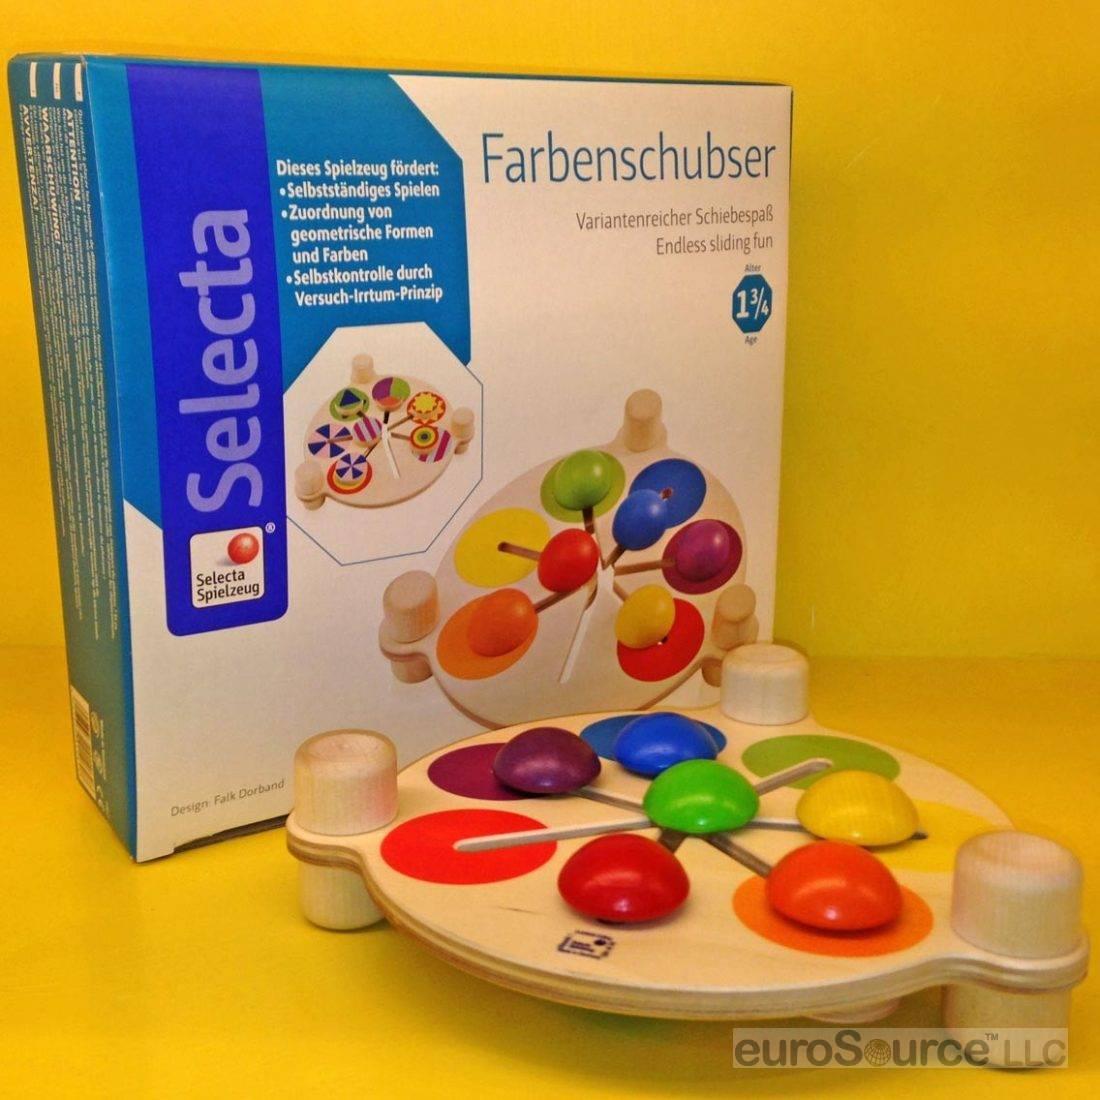 Selecta Farbenschubser Nuremberg 2014